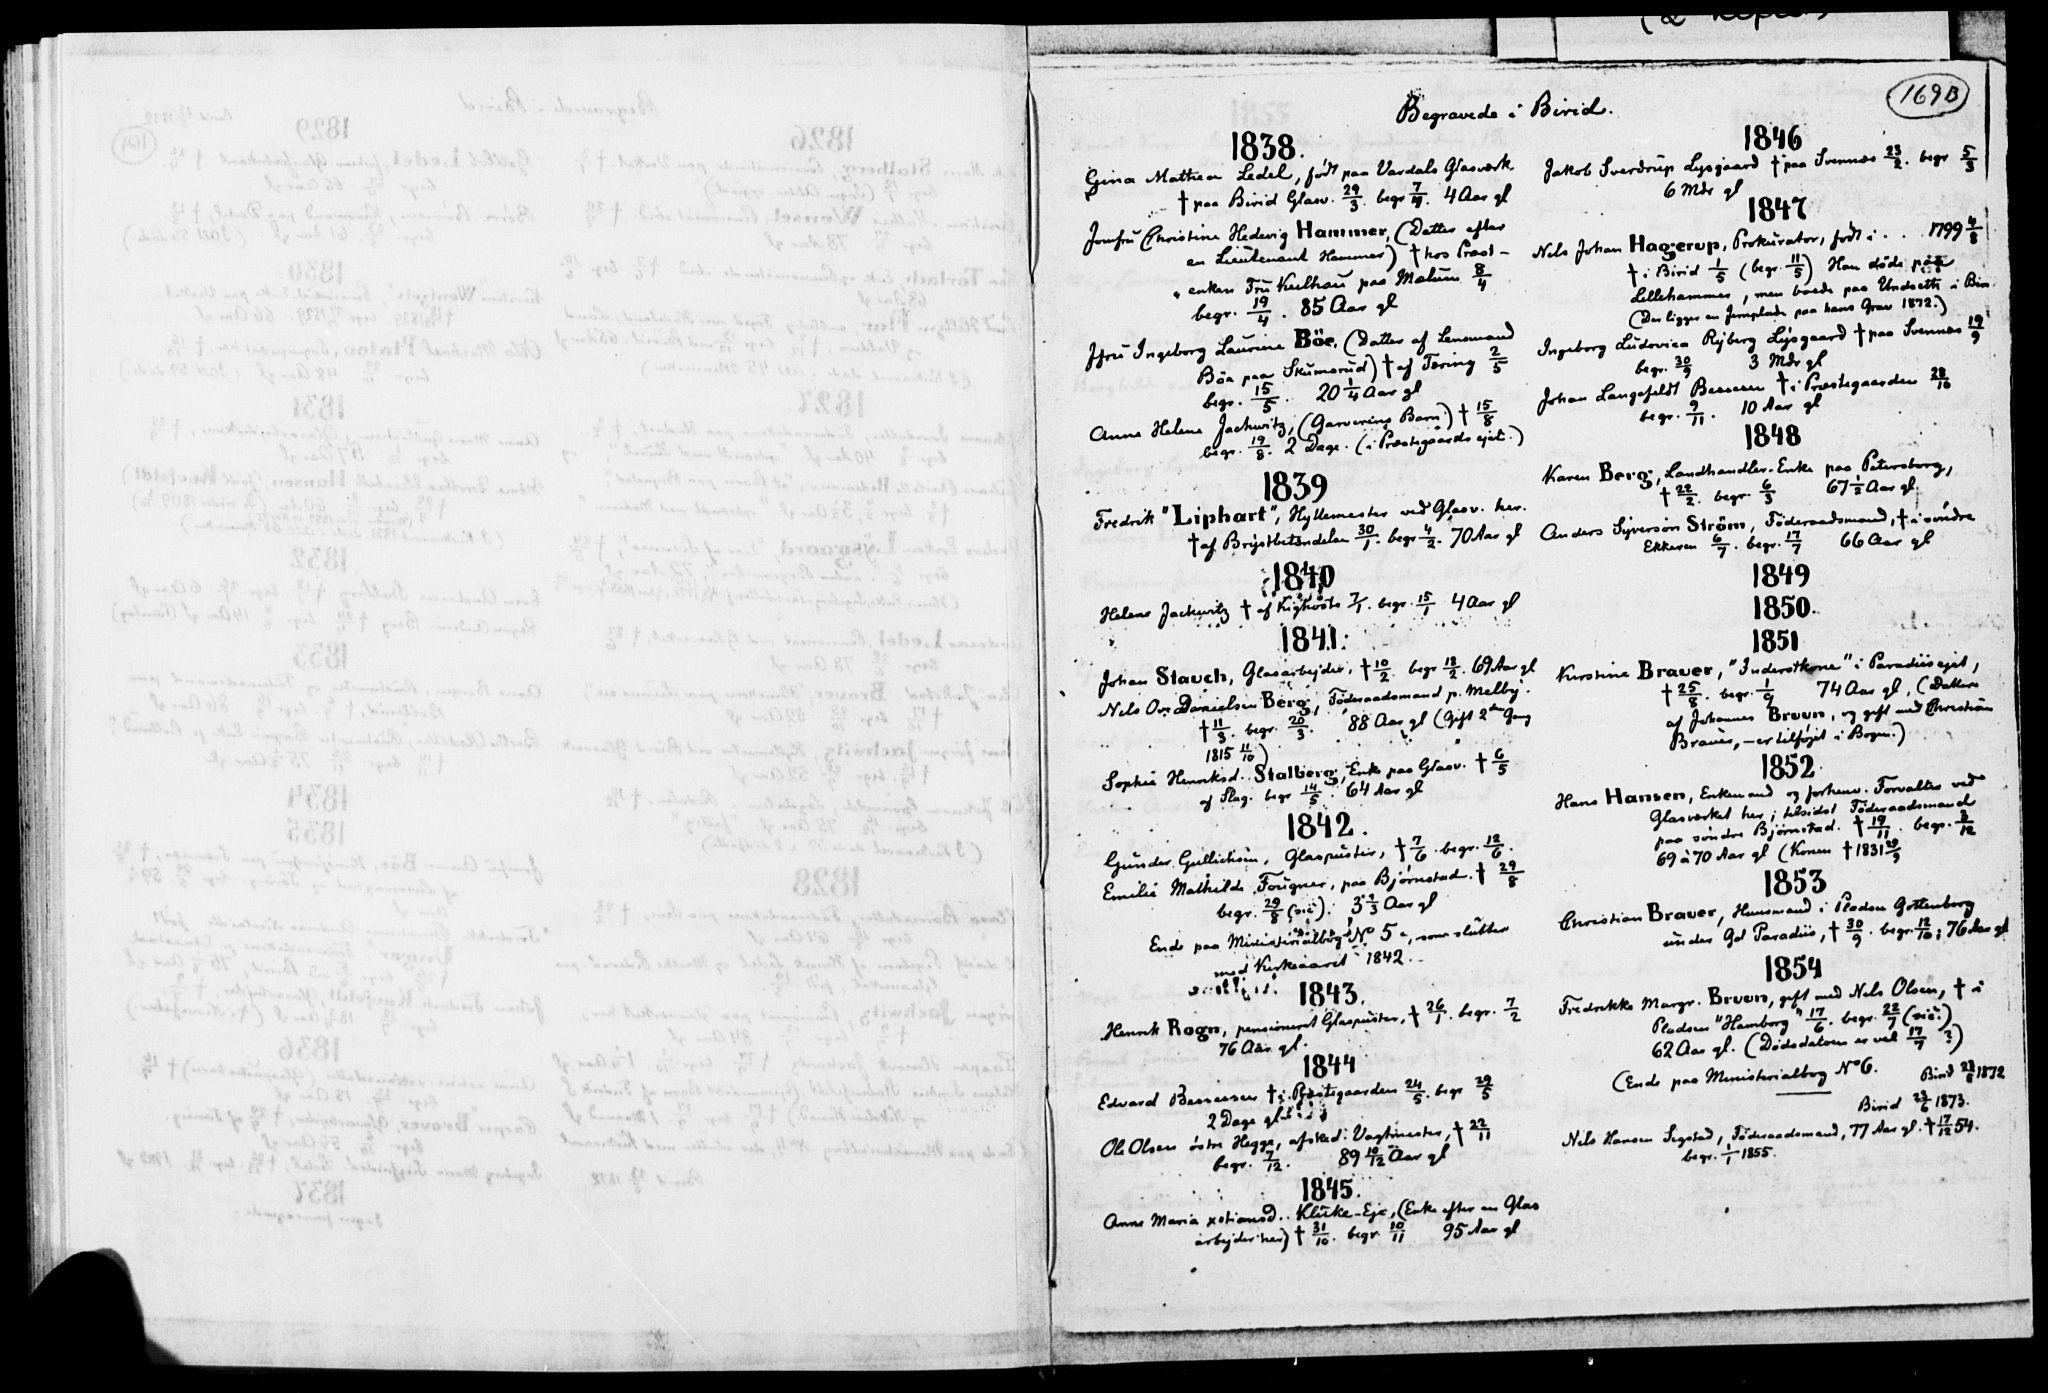 SAH, Biri prestekontor, Ministerialbok, 1730-1879, s. 169b